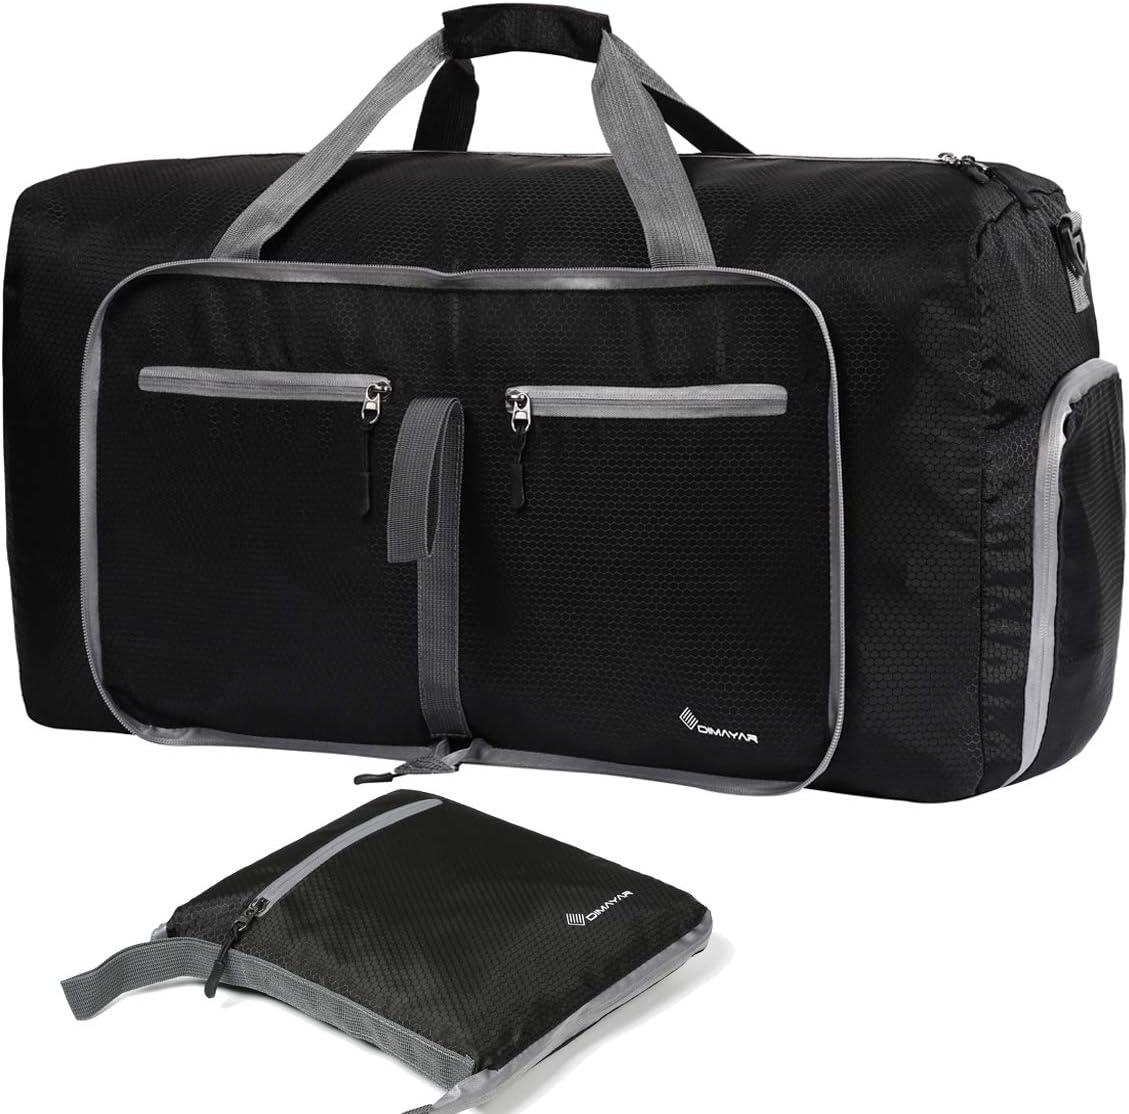 Dimayar Duffle Bag 60L Travel Duffle Bag for Men Women Waterproof Duffle Black